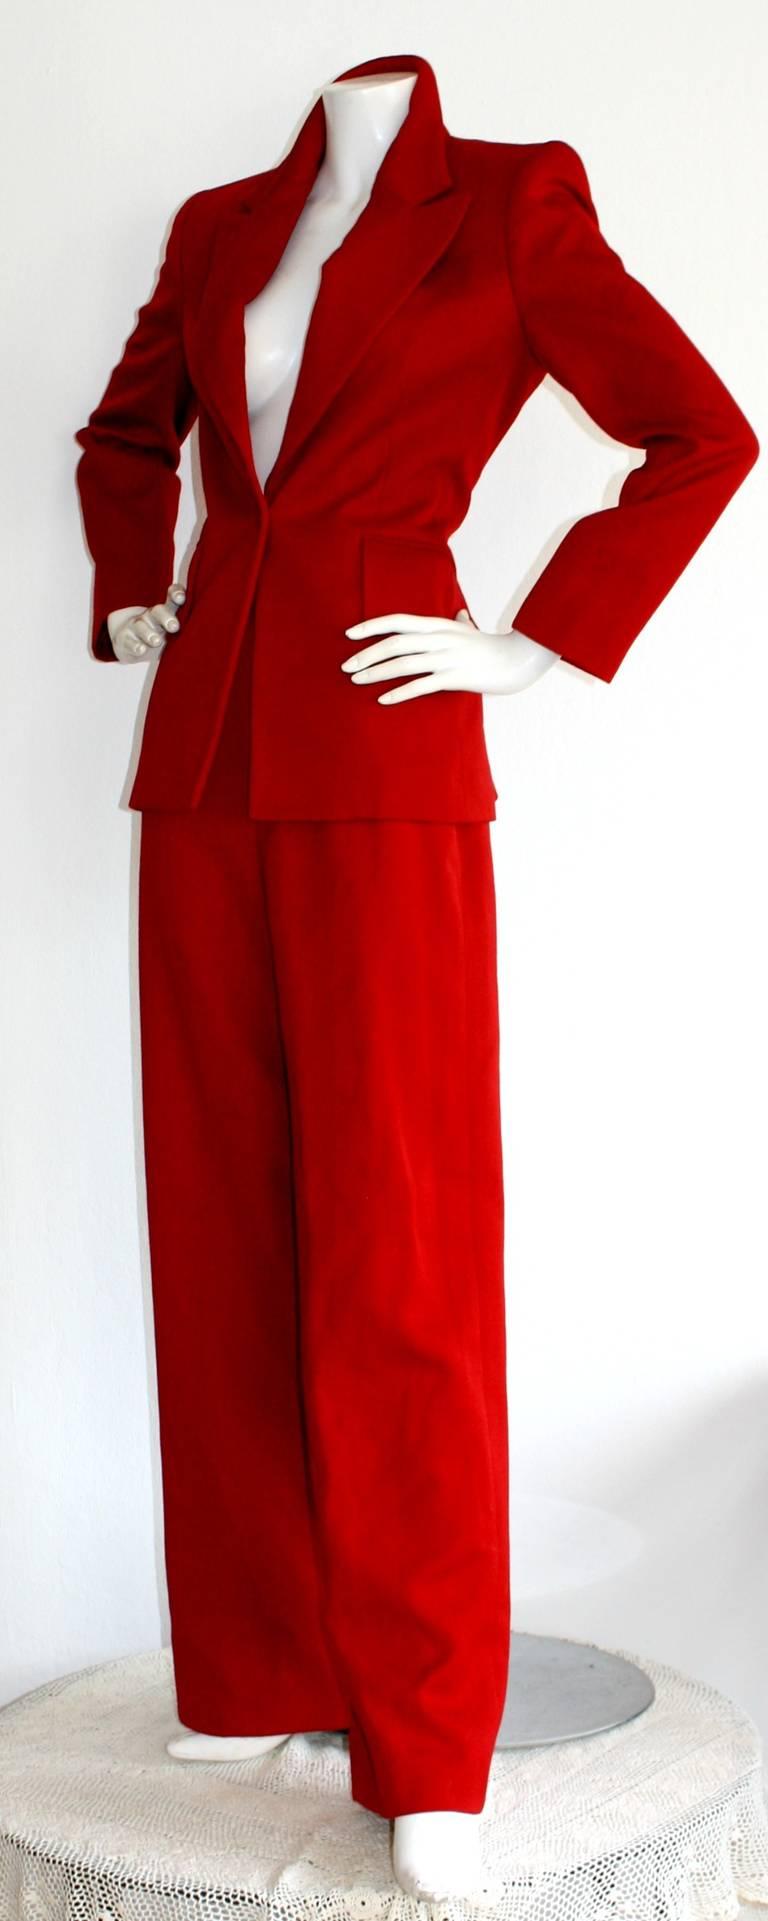 Isaac Mizrahi Vintage Lipstick Red Holiday Le Smoking Suit At 1stdibs